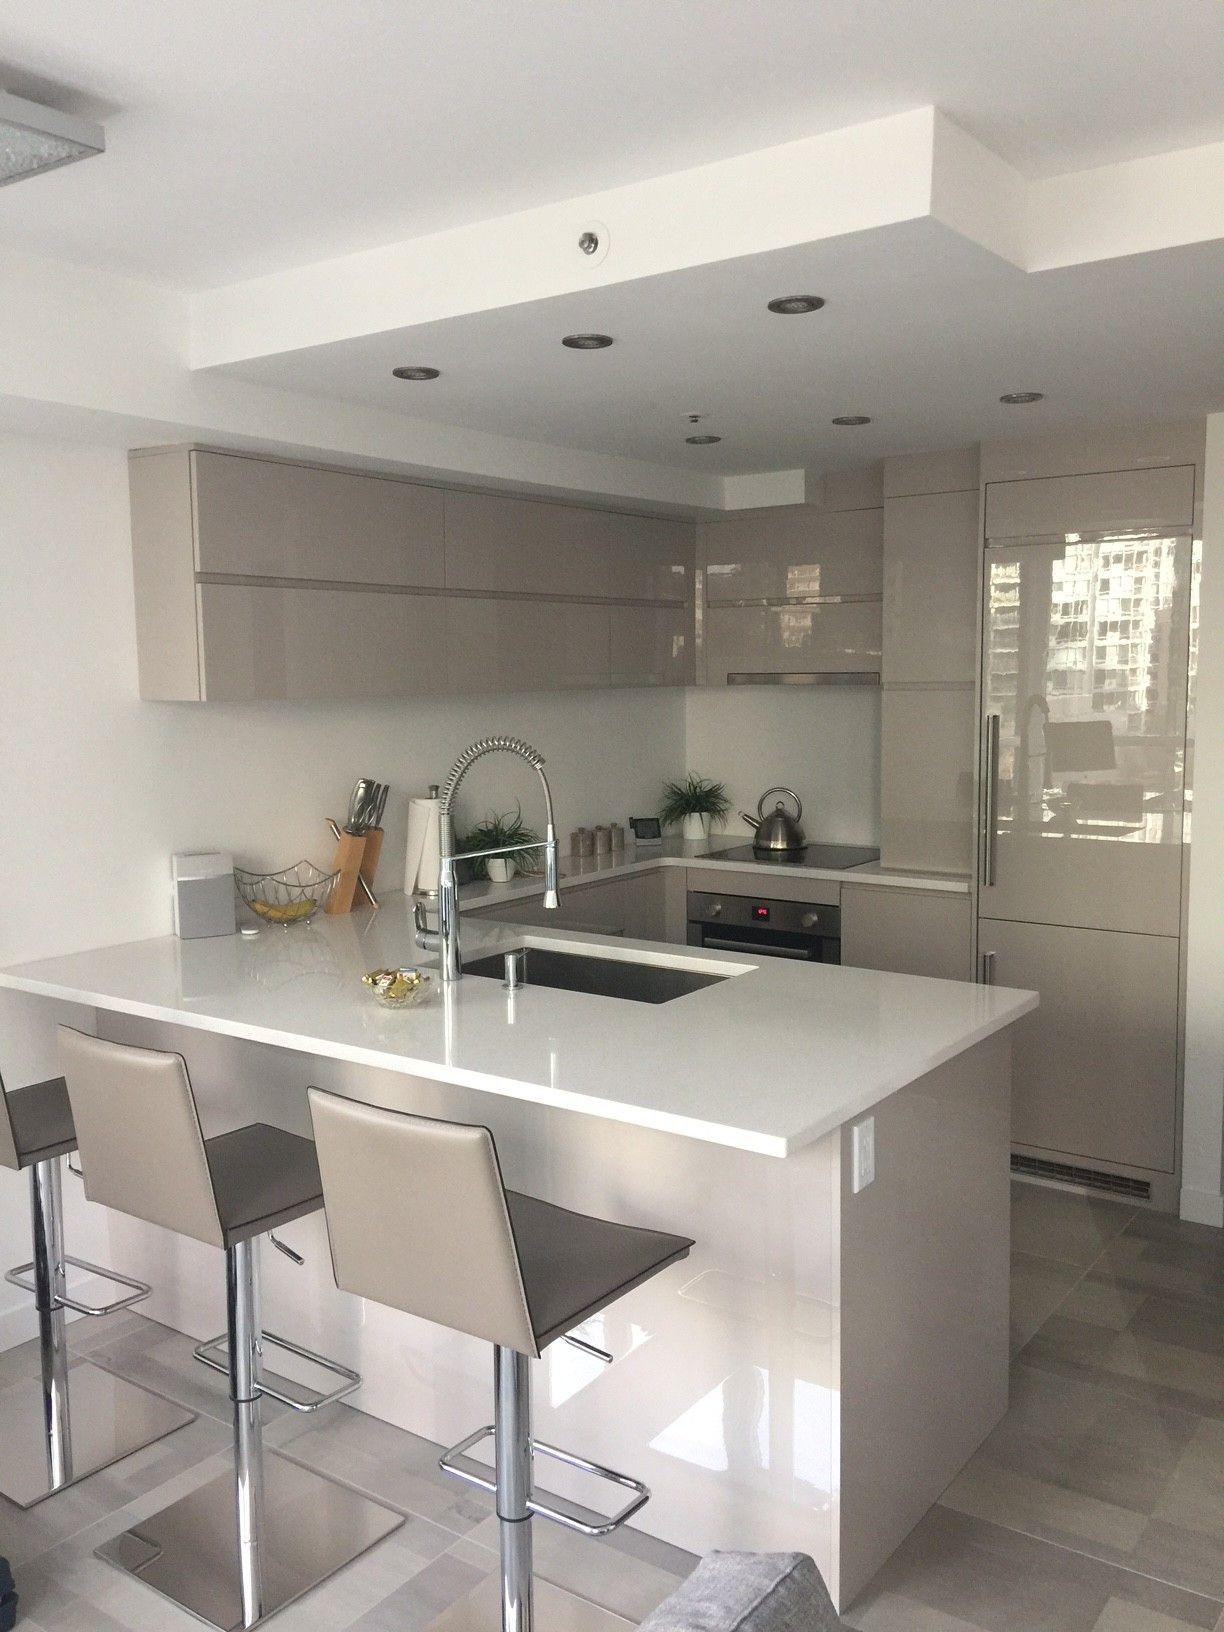 Decoration Cuisine Moderne 2021 Kitchen Design Open Modern Kitchen Design Home Decor Kitchen